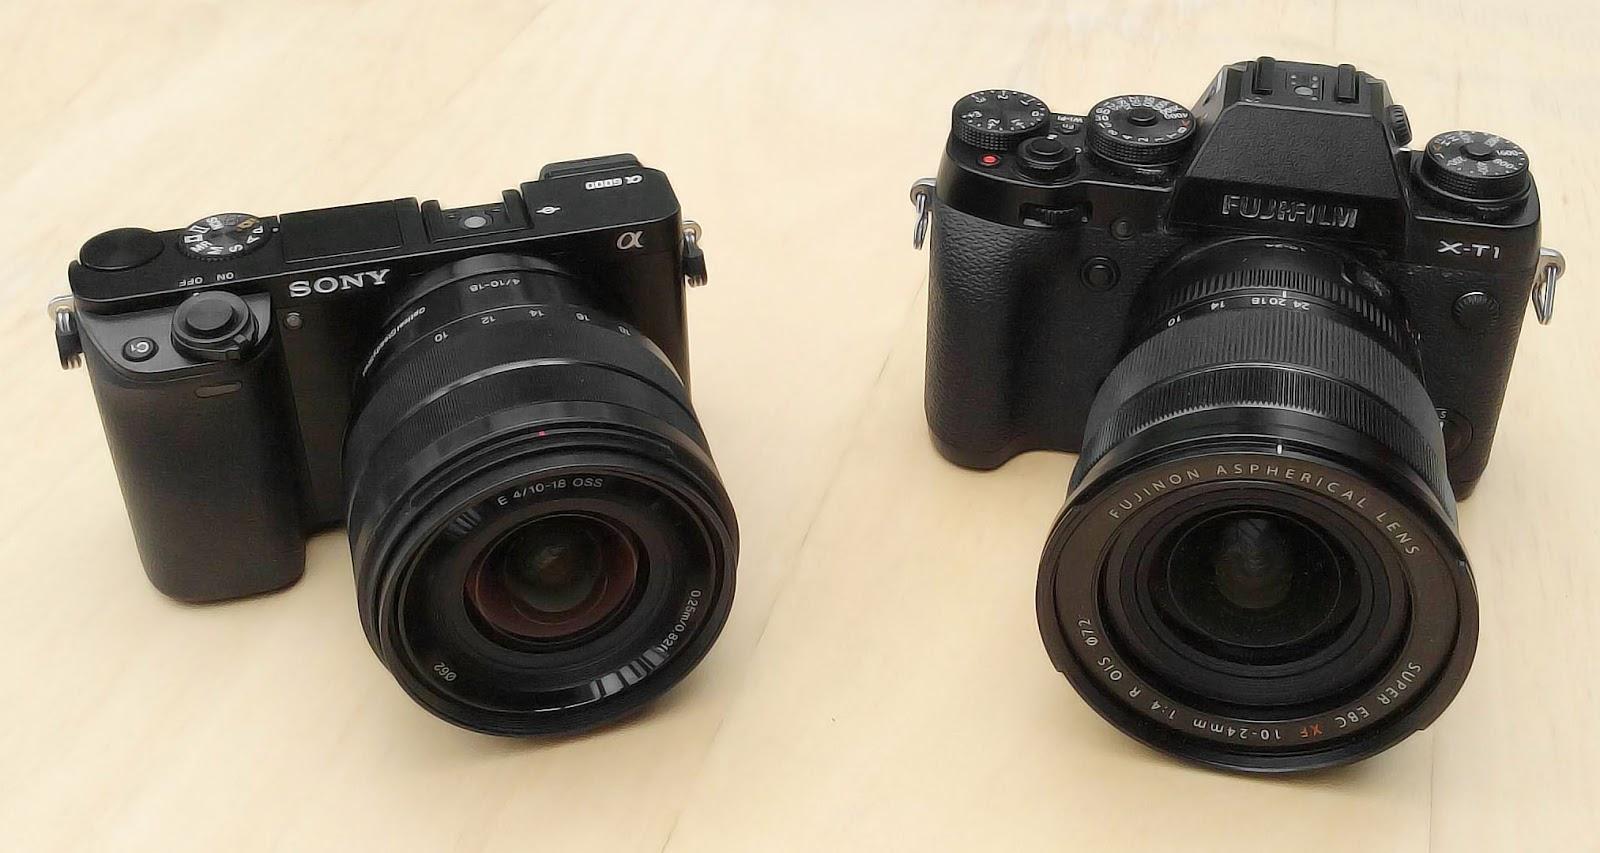 soundimageplus sony 10 18mm f4 e mount lens compared to fujifilm fujinon xf 10 24mm f 4 r ois lens. Black Bedroom Furniture Sets. Home Design Ideas